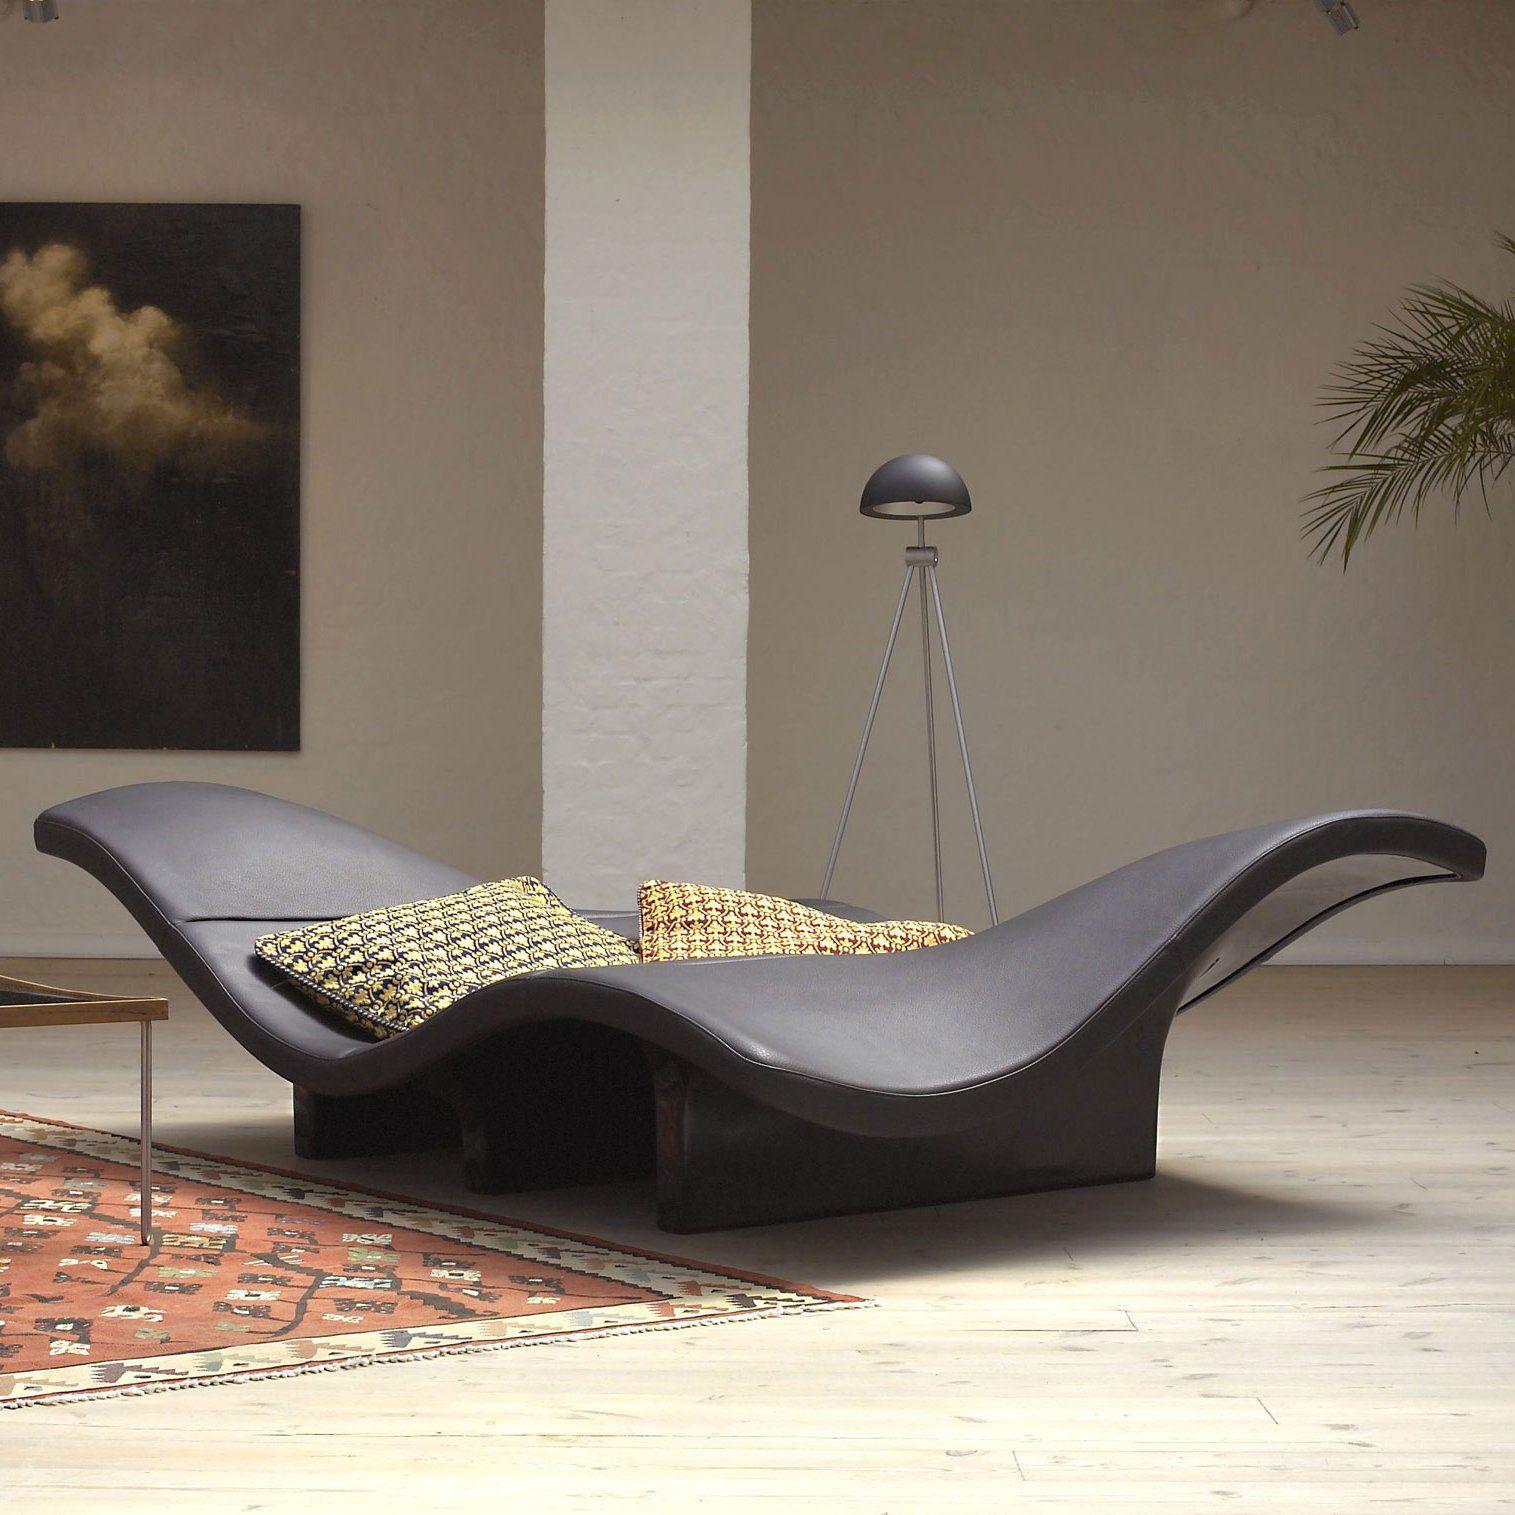 mbel sofa beautiful neckermann mbel sofa with neckermann mbel sofa with mbel sofa sofa modena. Black Bedroom Furniture Sets. Home Design Ideas